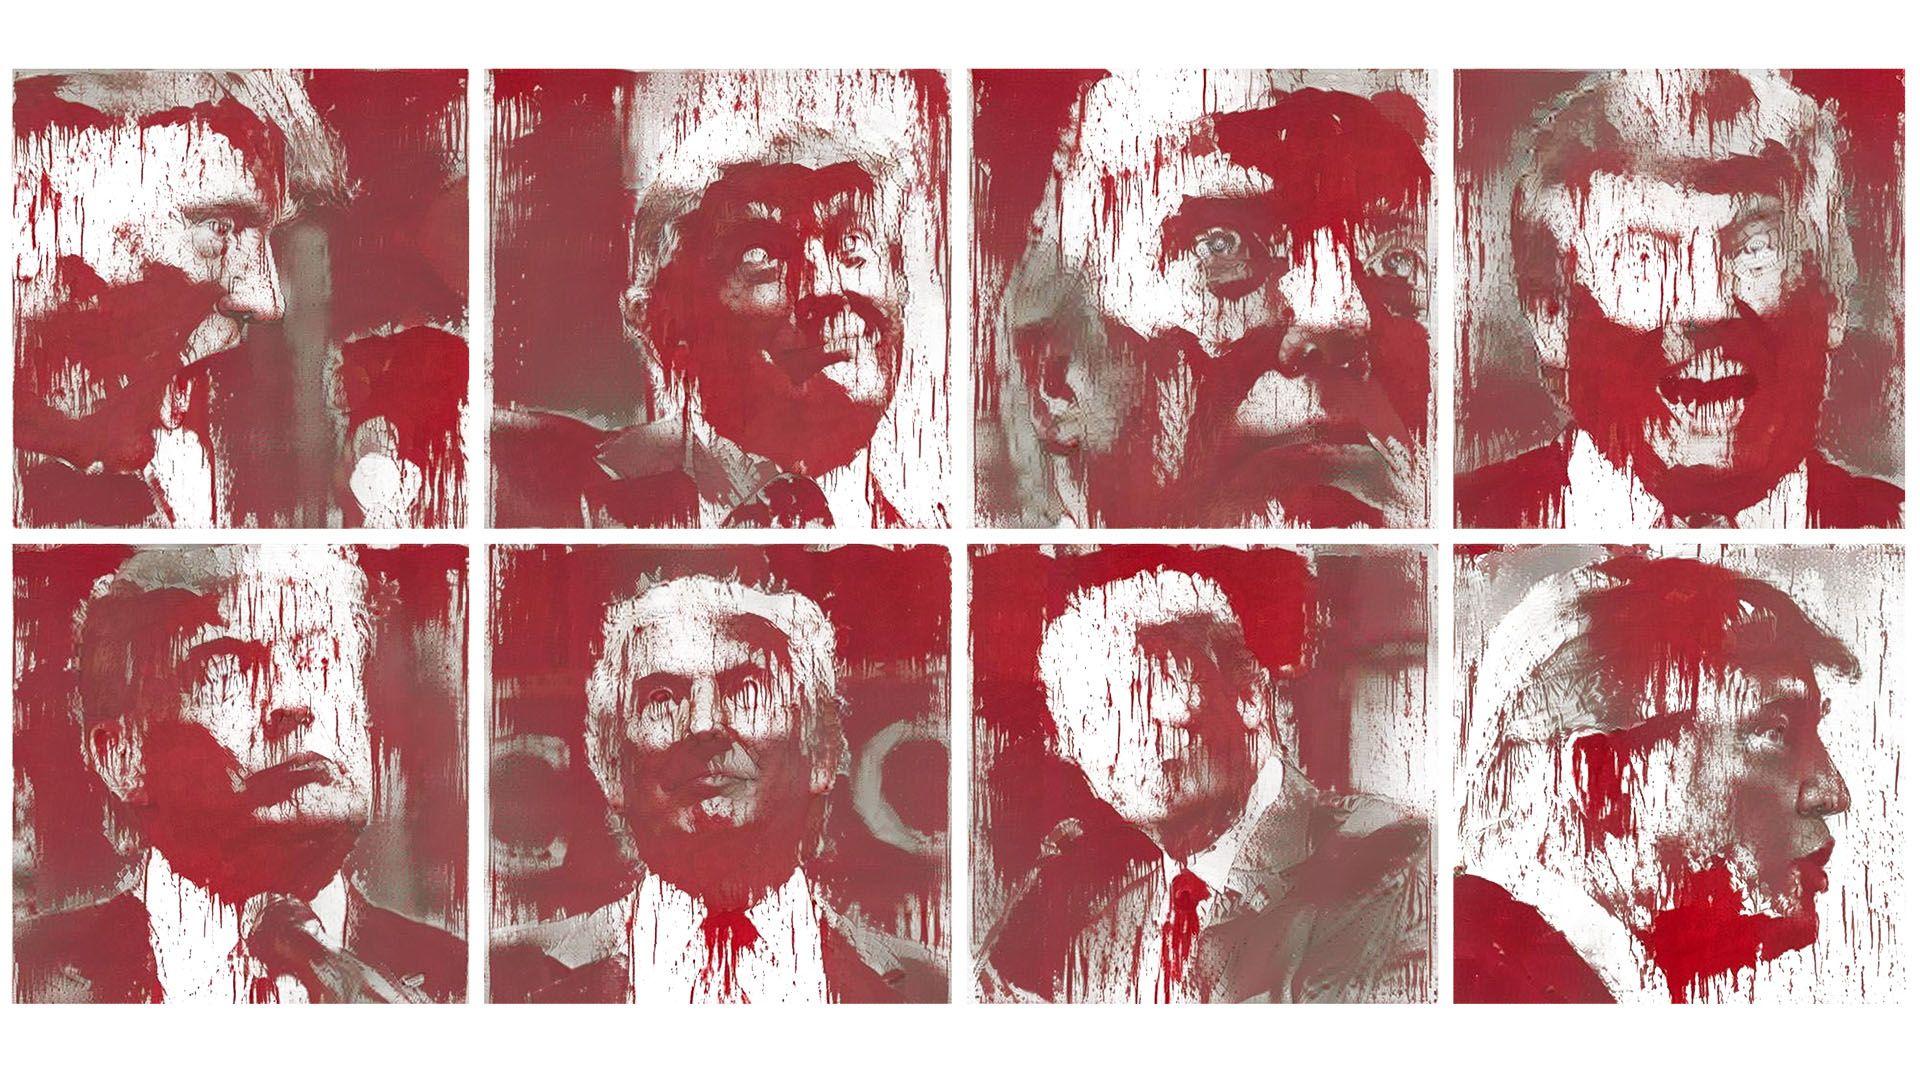 Trump deepX Hermann Nitsch [1920×1080] Need #iPhone #6S #Plus #Wallpaper/ #Backg… 4K